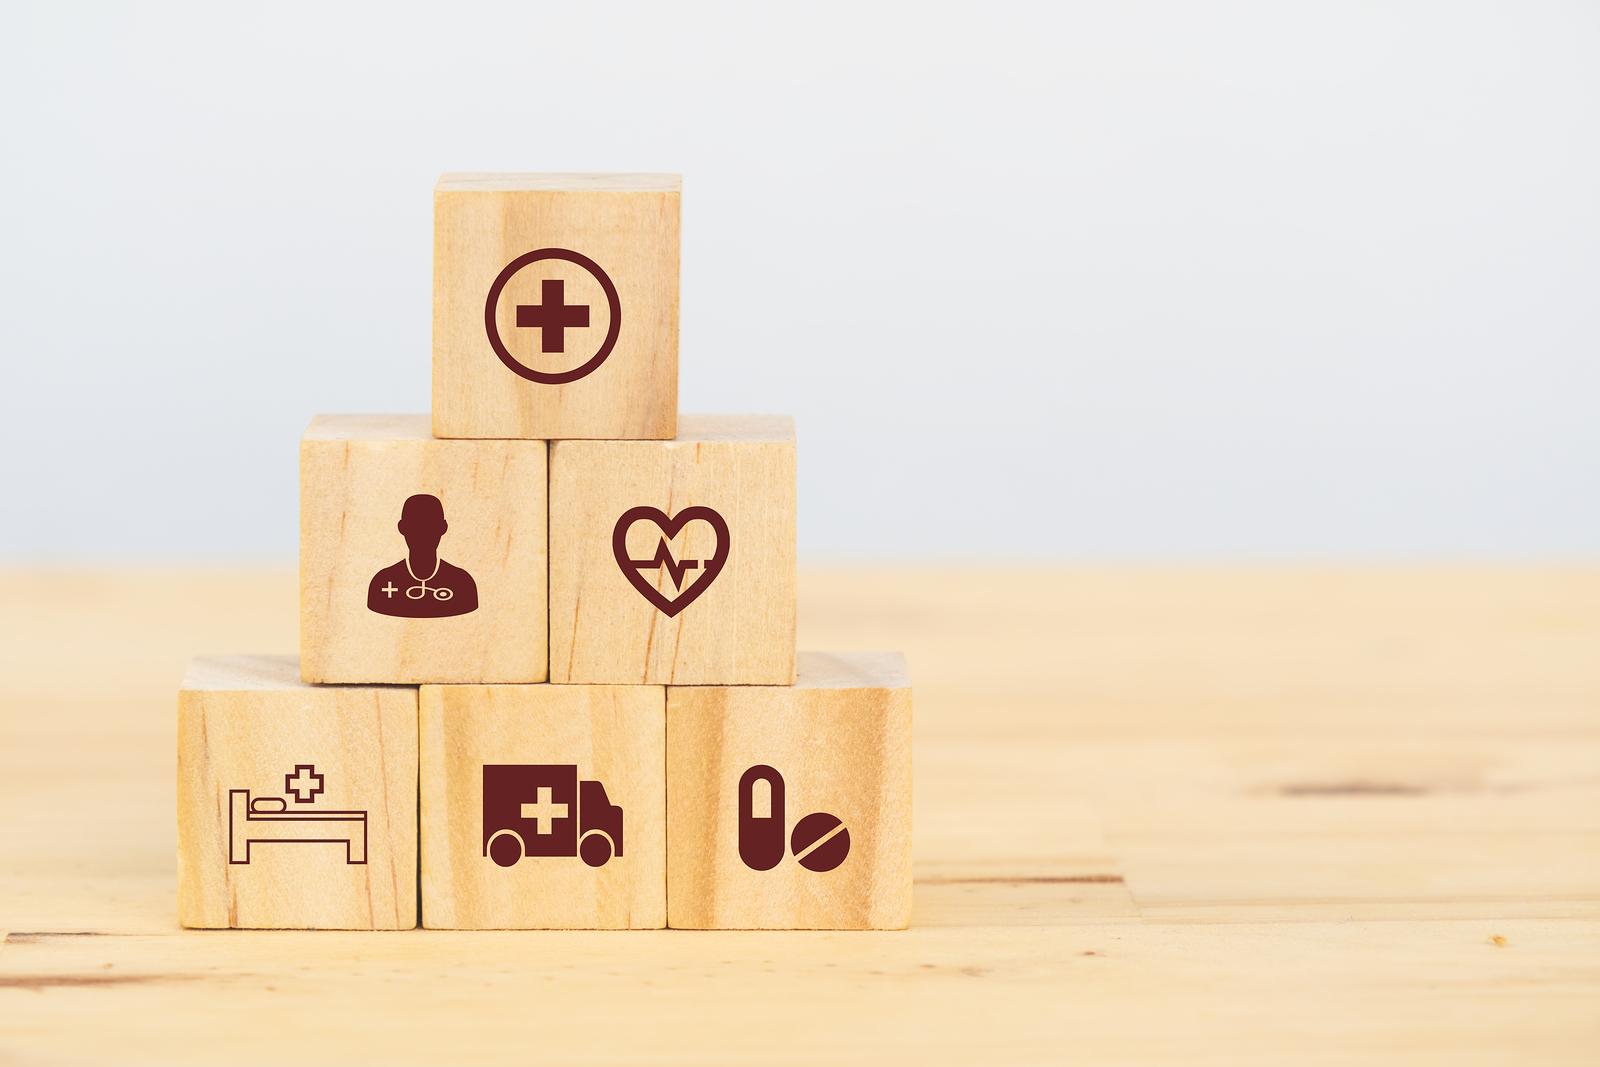 bigstock-Smart-Health-Care-Insurance-C-264695347.jpg